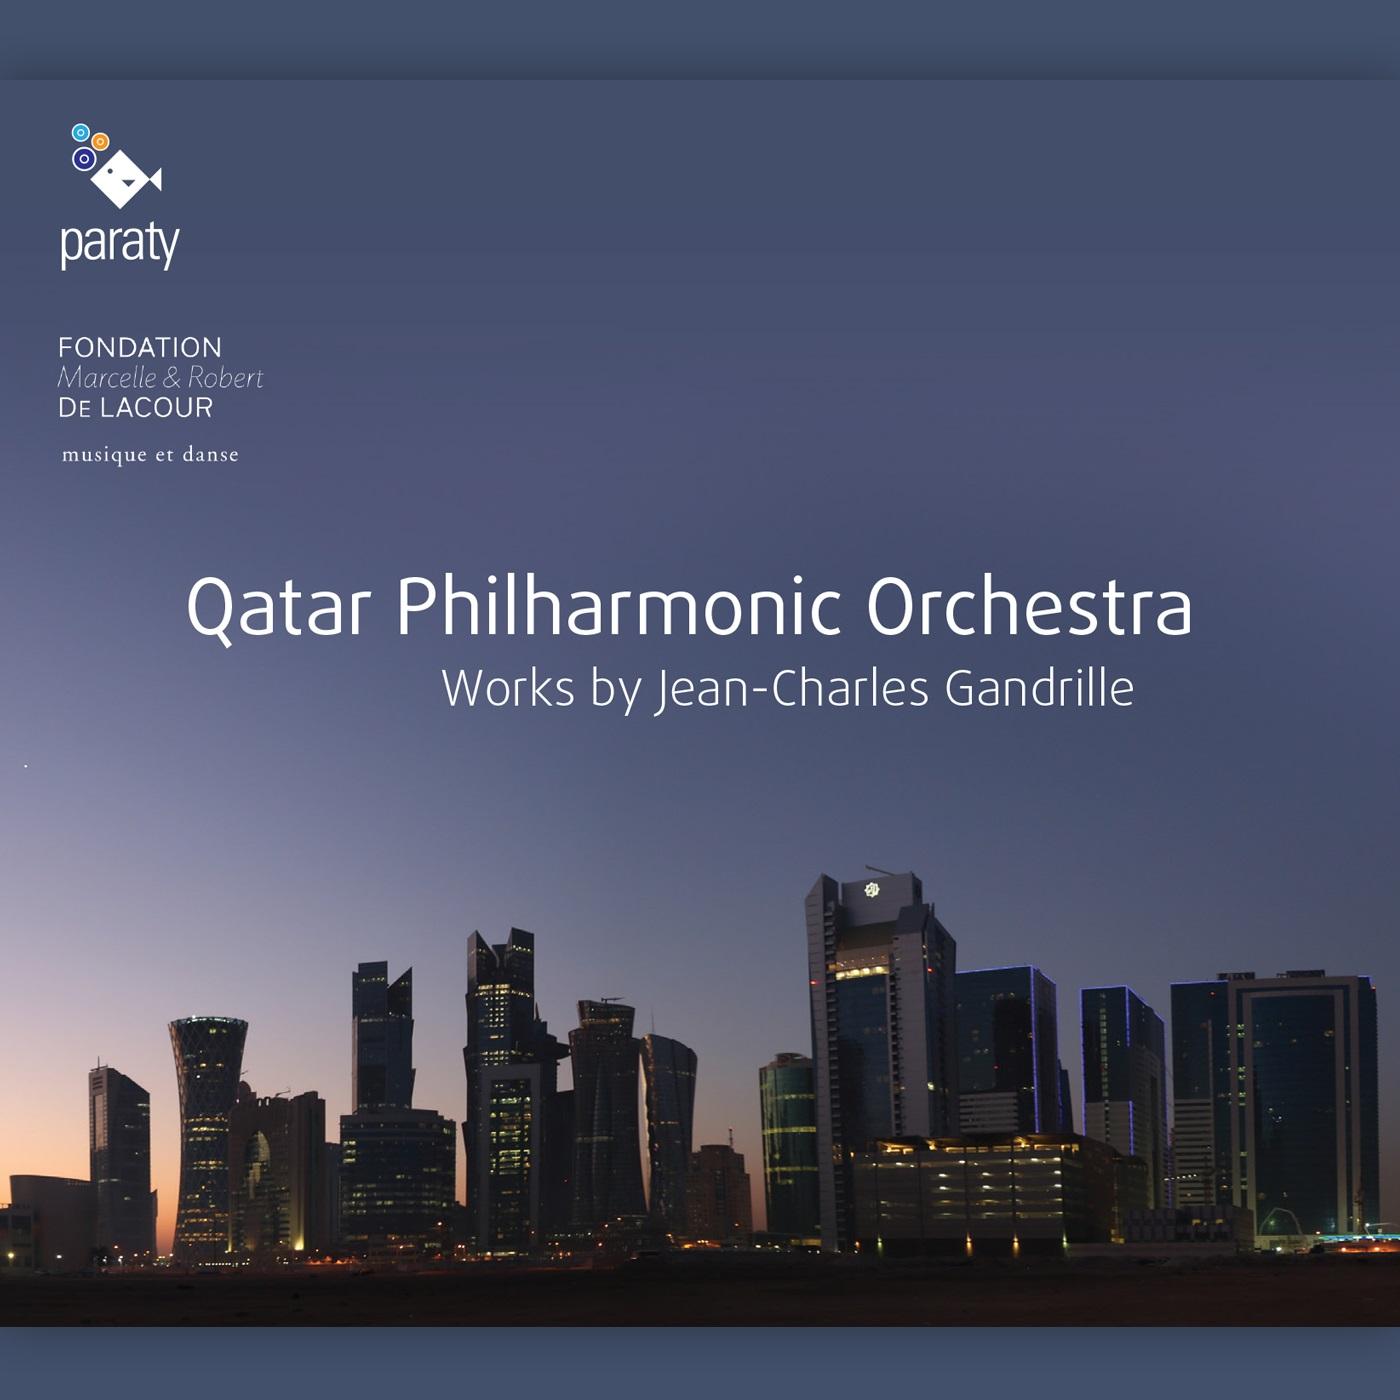 Qatar Philarmonic Orchestra, Works by Jean-Charles Gandrille